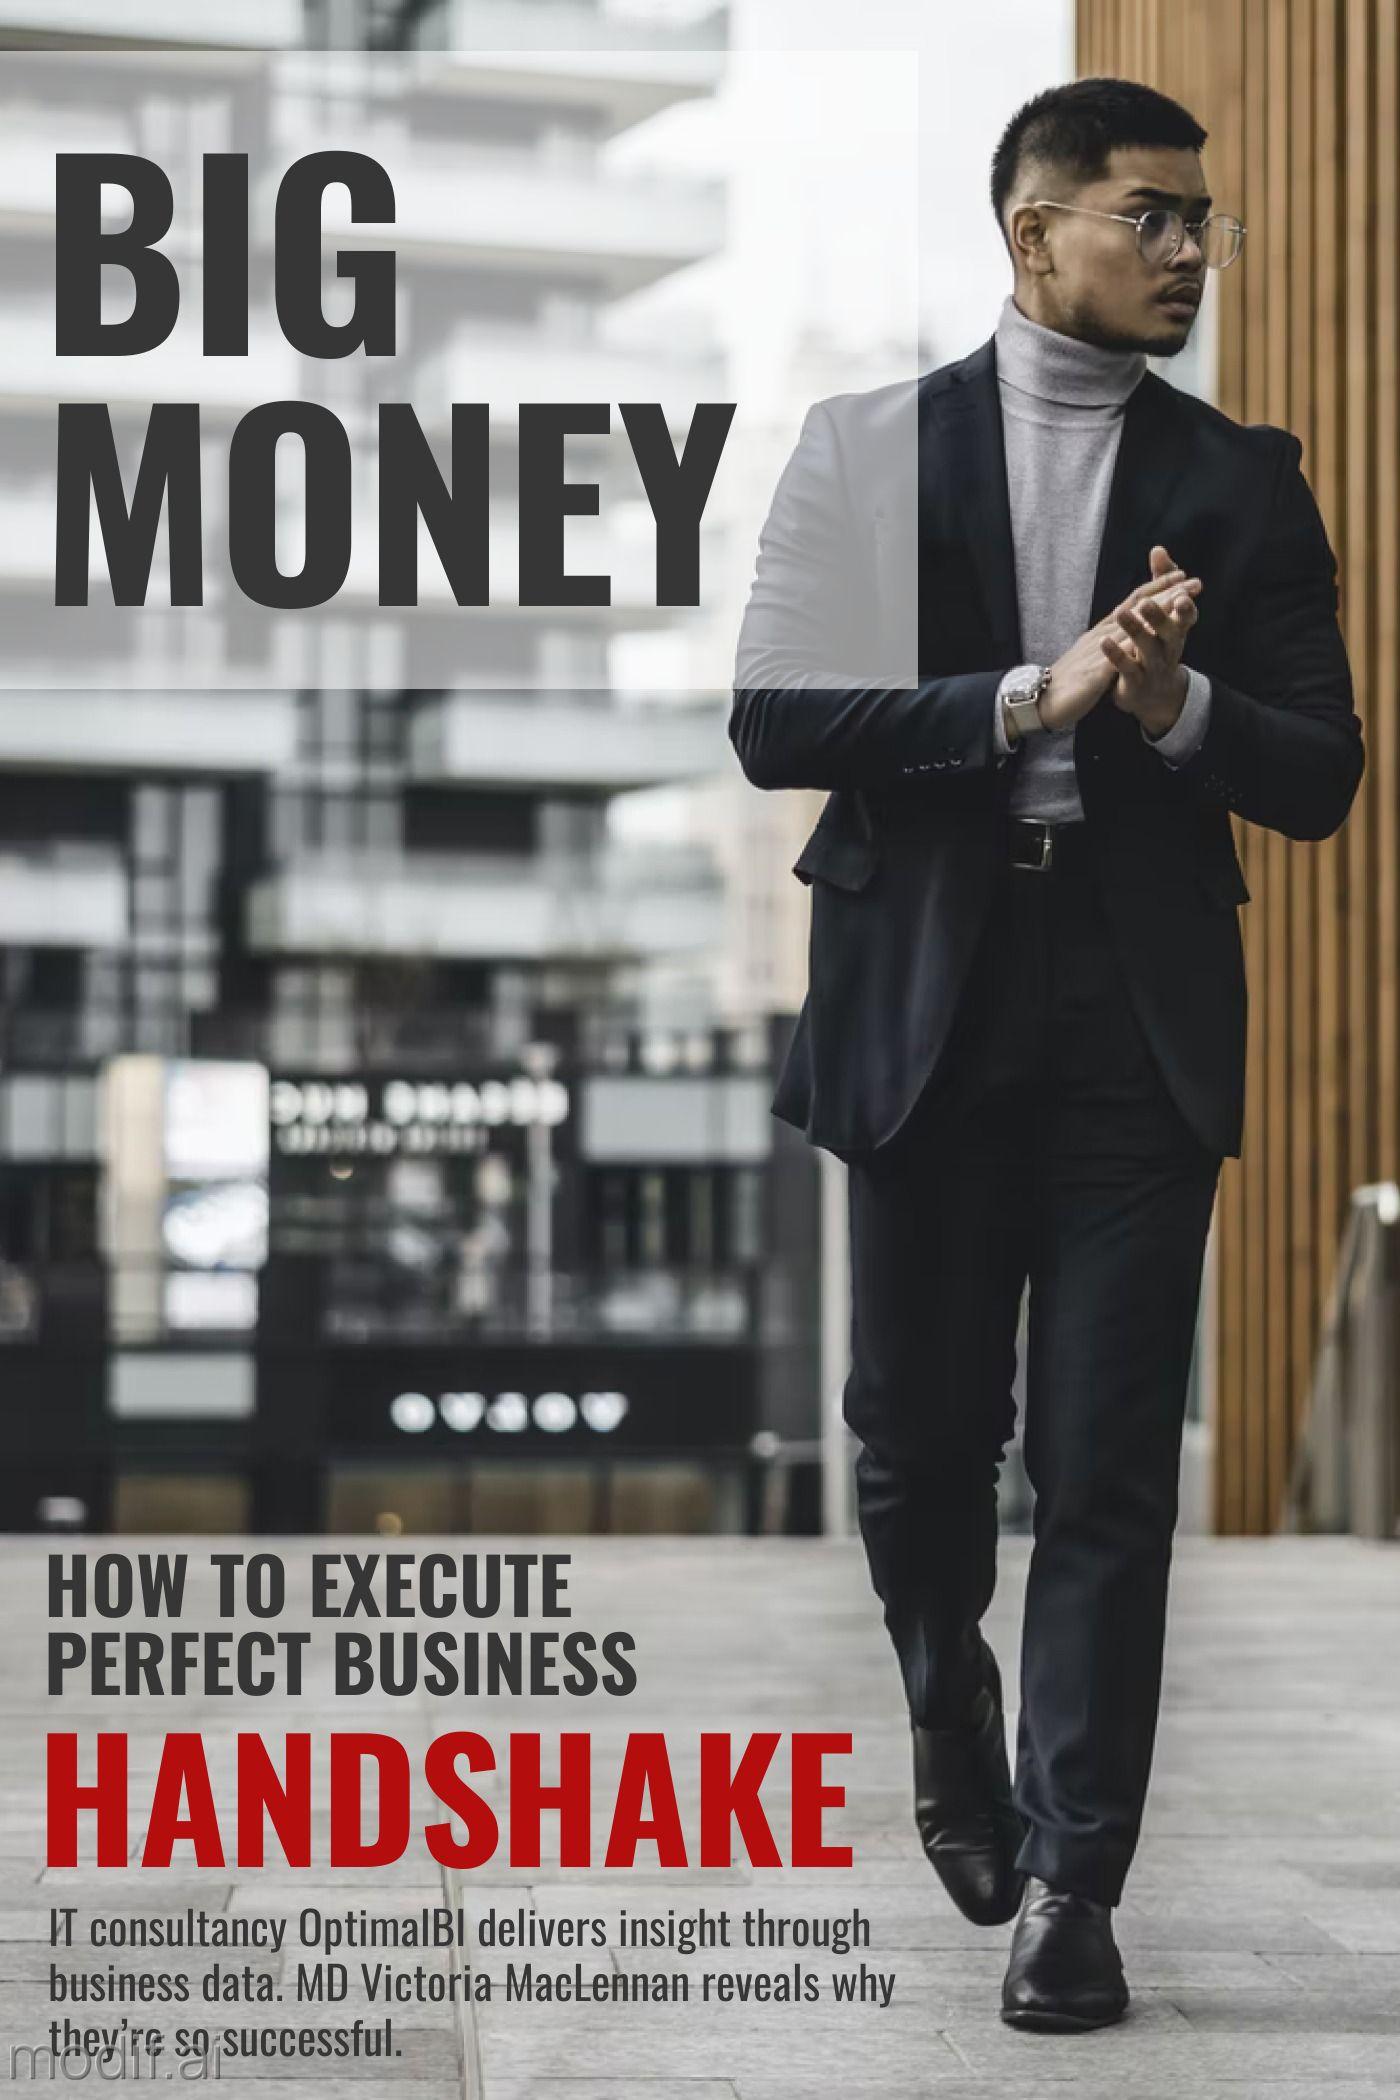 Big Money Magazine Cover Design